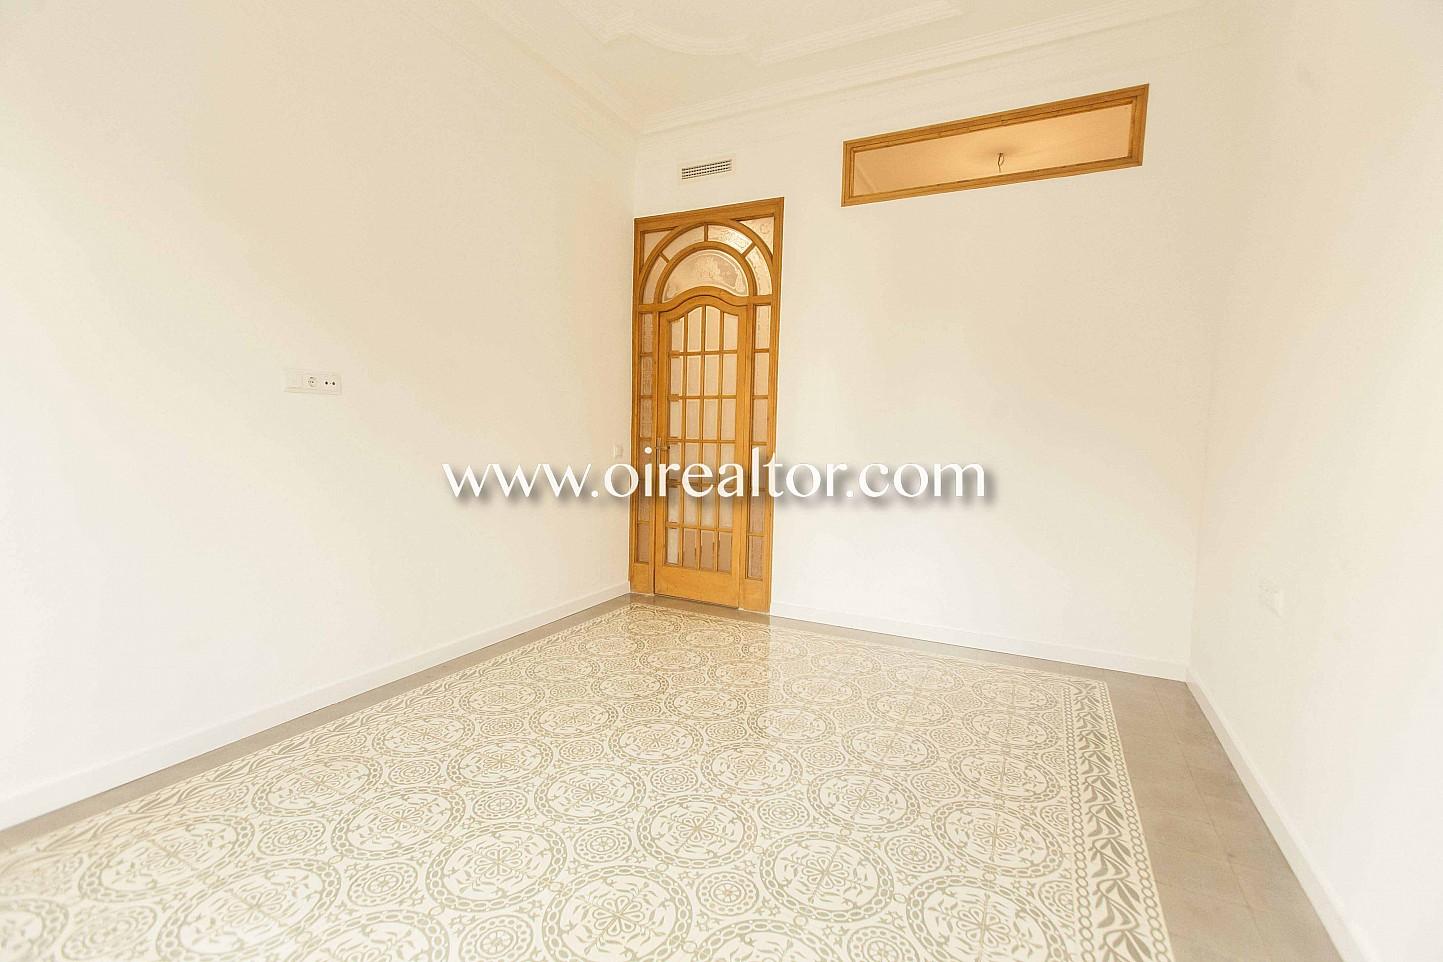 habitación, suelo de mosaico, mosaico, modernista, modernismo catalán, finca regia, luminoso, soleado, balcón